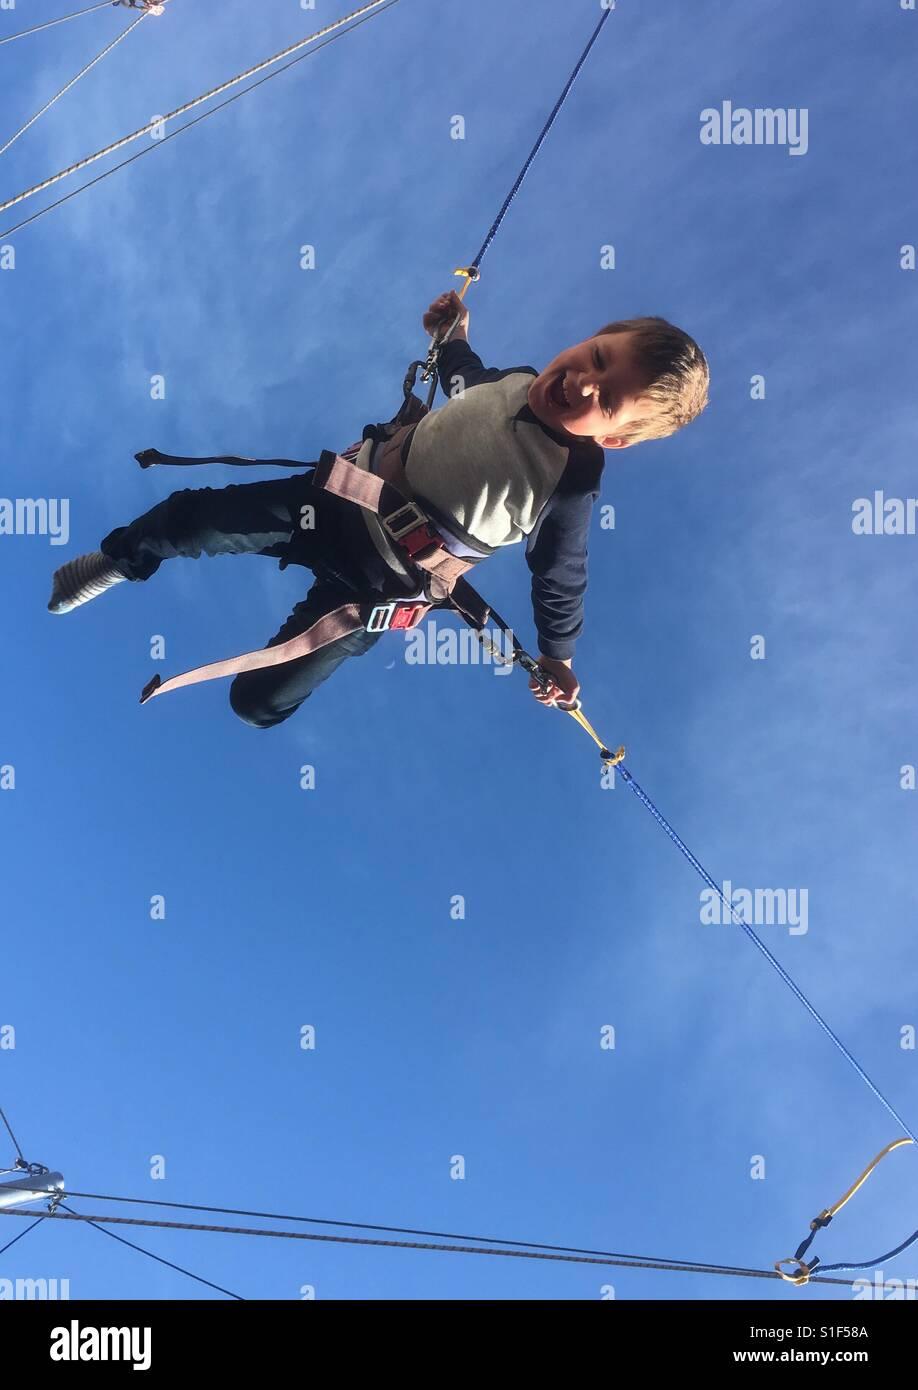 Boy bouncing on elastic rope - Stock Image